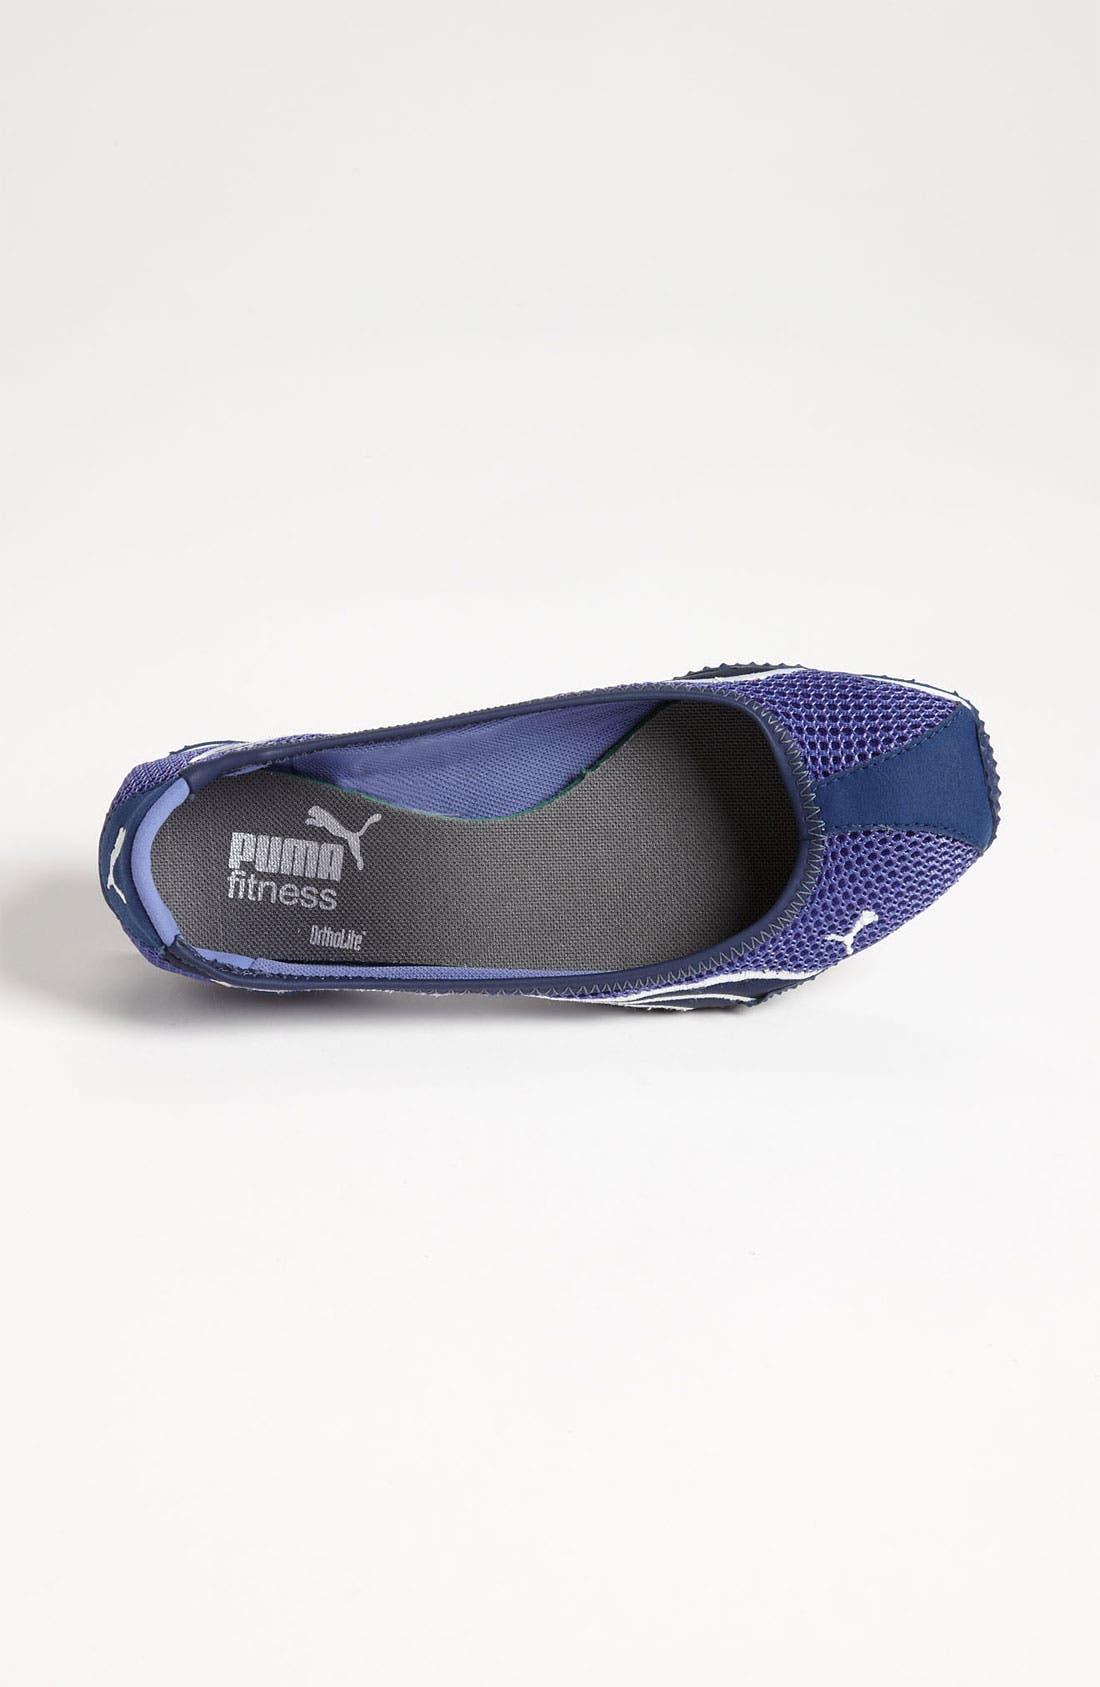 Alternate Image 3  - Puma 'H Street' Athletic Shoe (Women)